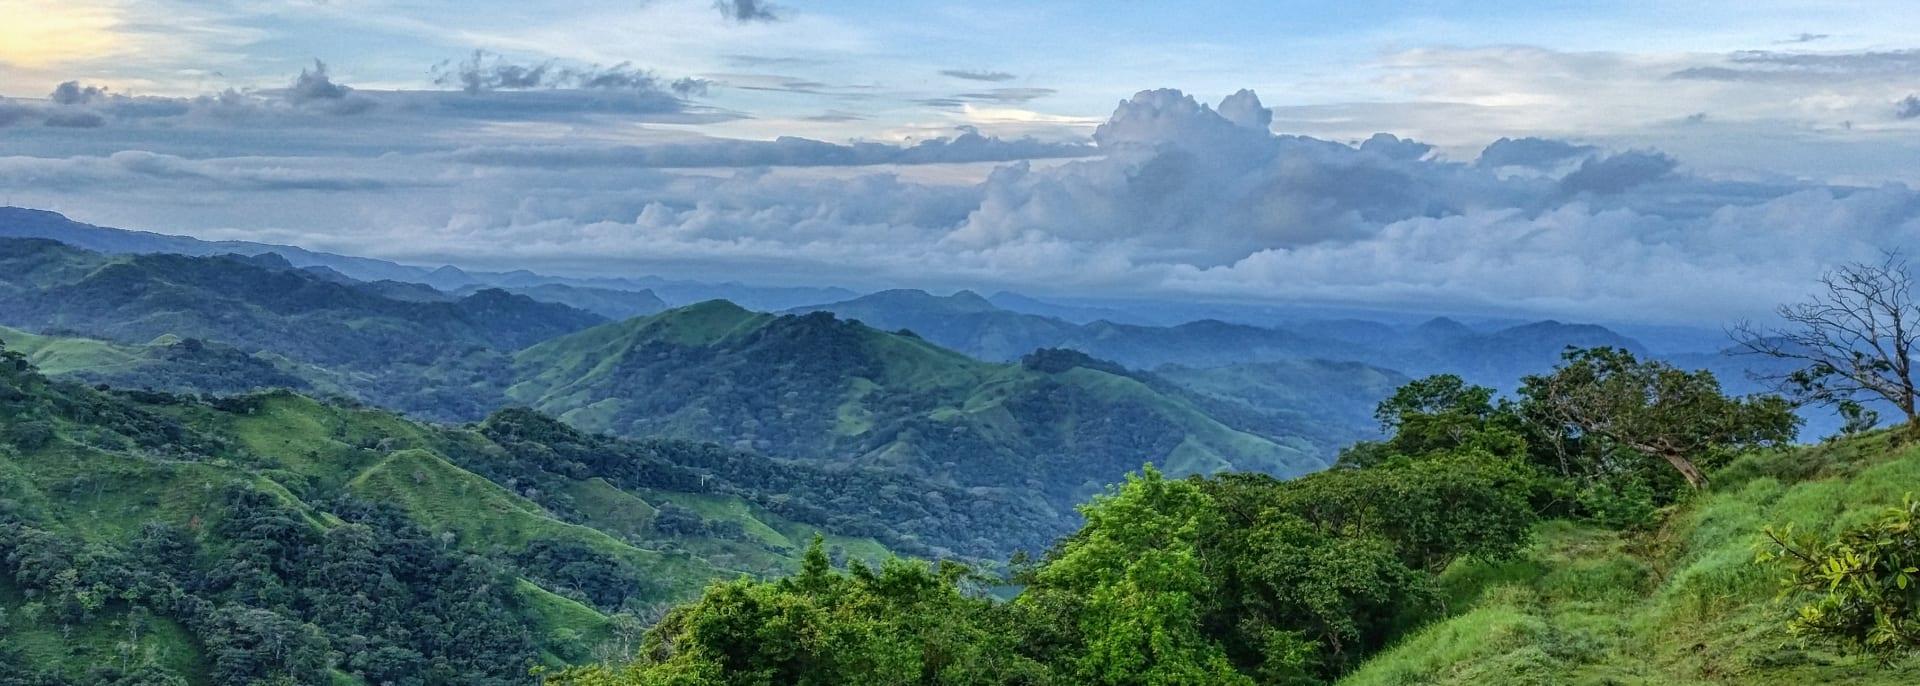 Boca Tapada, Costa Rica